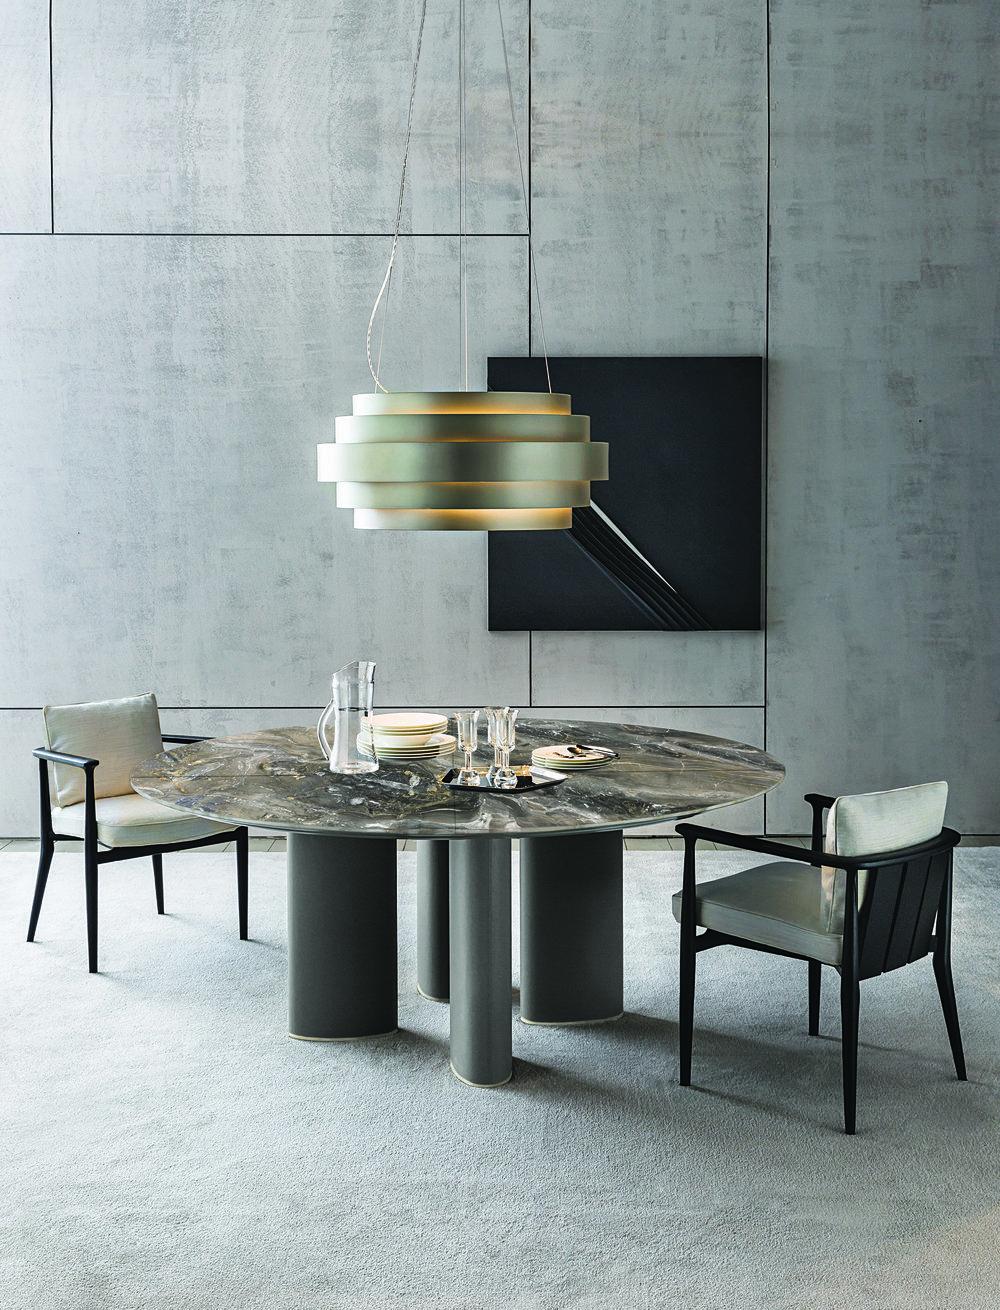 Arne dining table | Interior Design | Pinterest | Calacatta, Marble ...